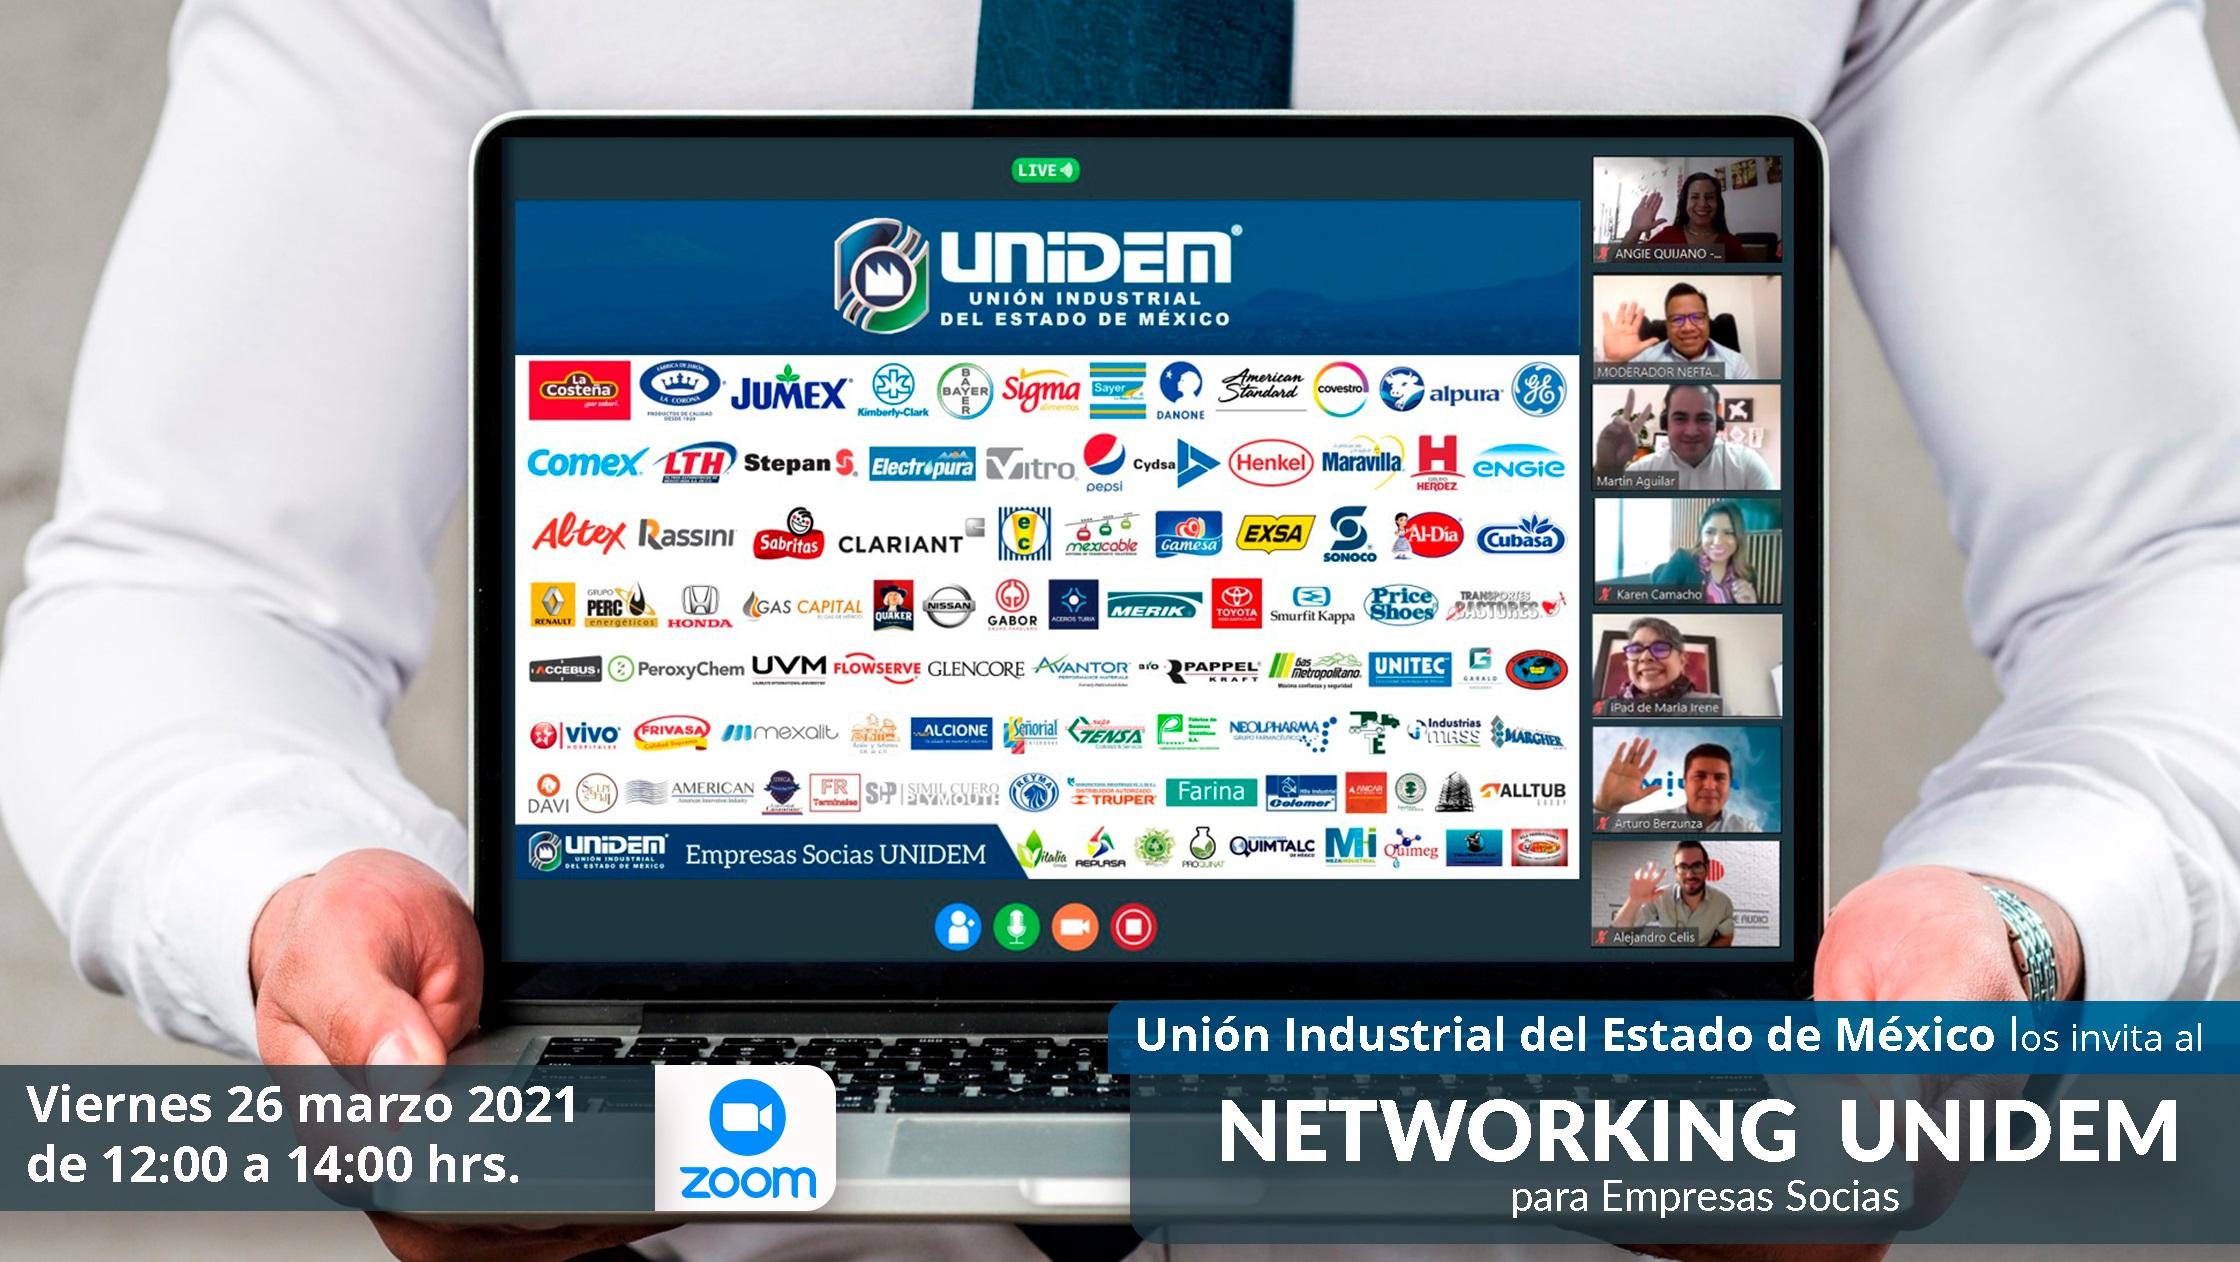 Flyer - 2021 02 26 - Rueda de Negocios para empresas SOCIAS UNIDEM 800 x 450